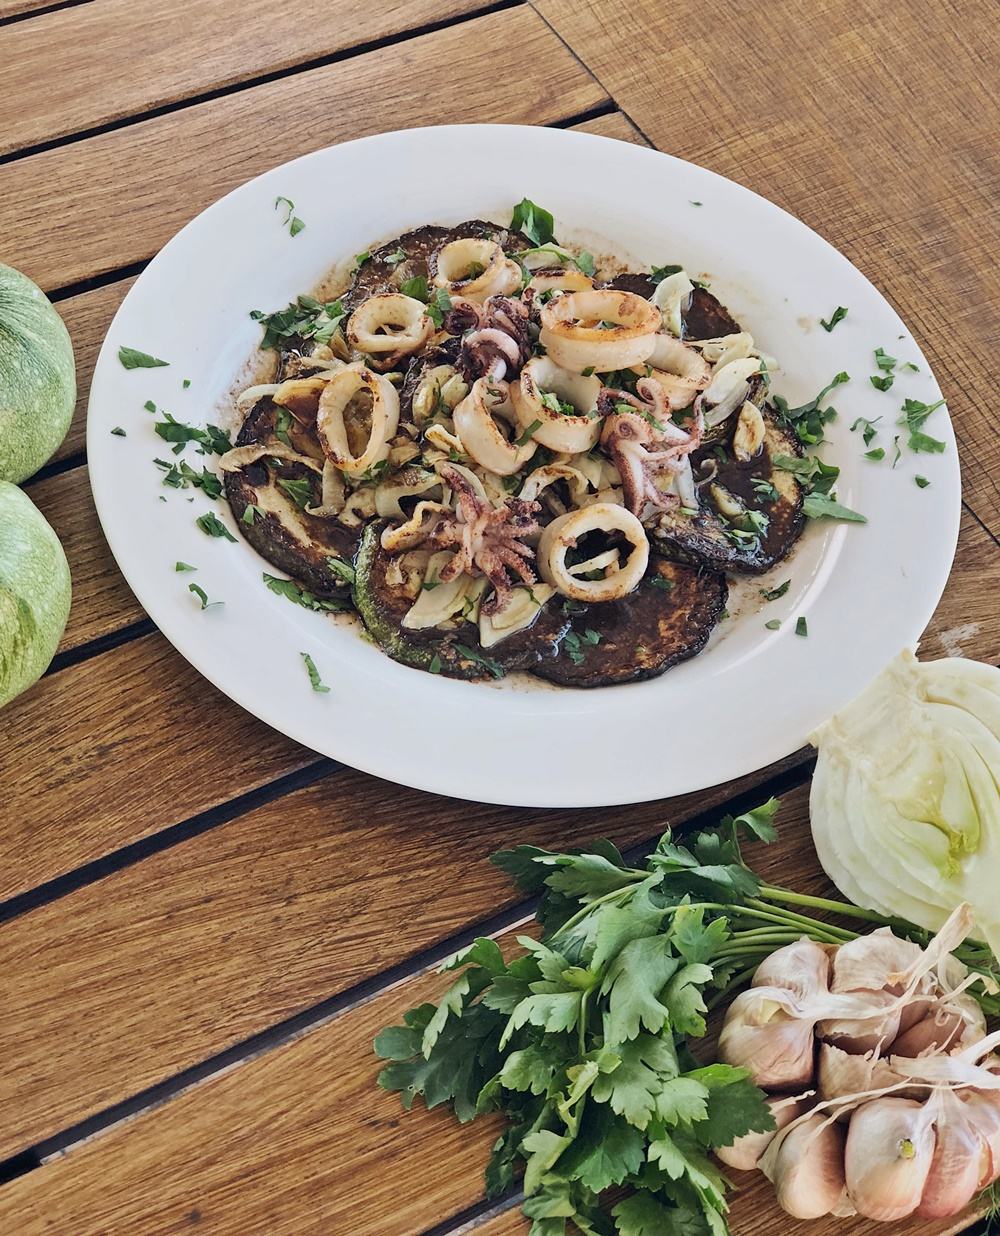 warmer Zucchini-Fenchel-Salat mit Balsamico-Senf Dressing & Calamari